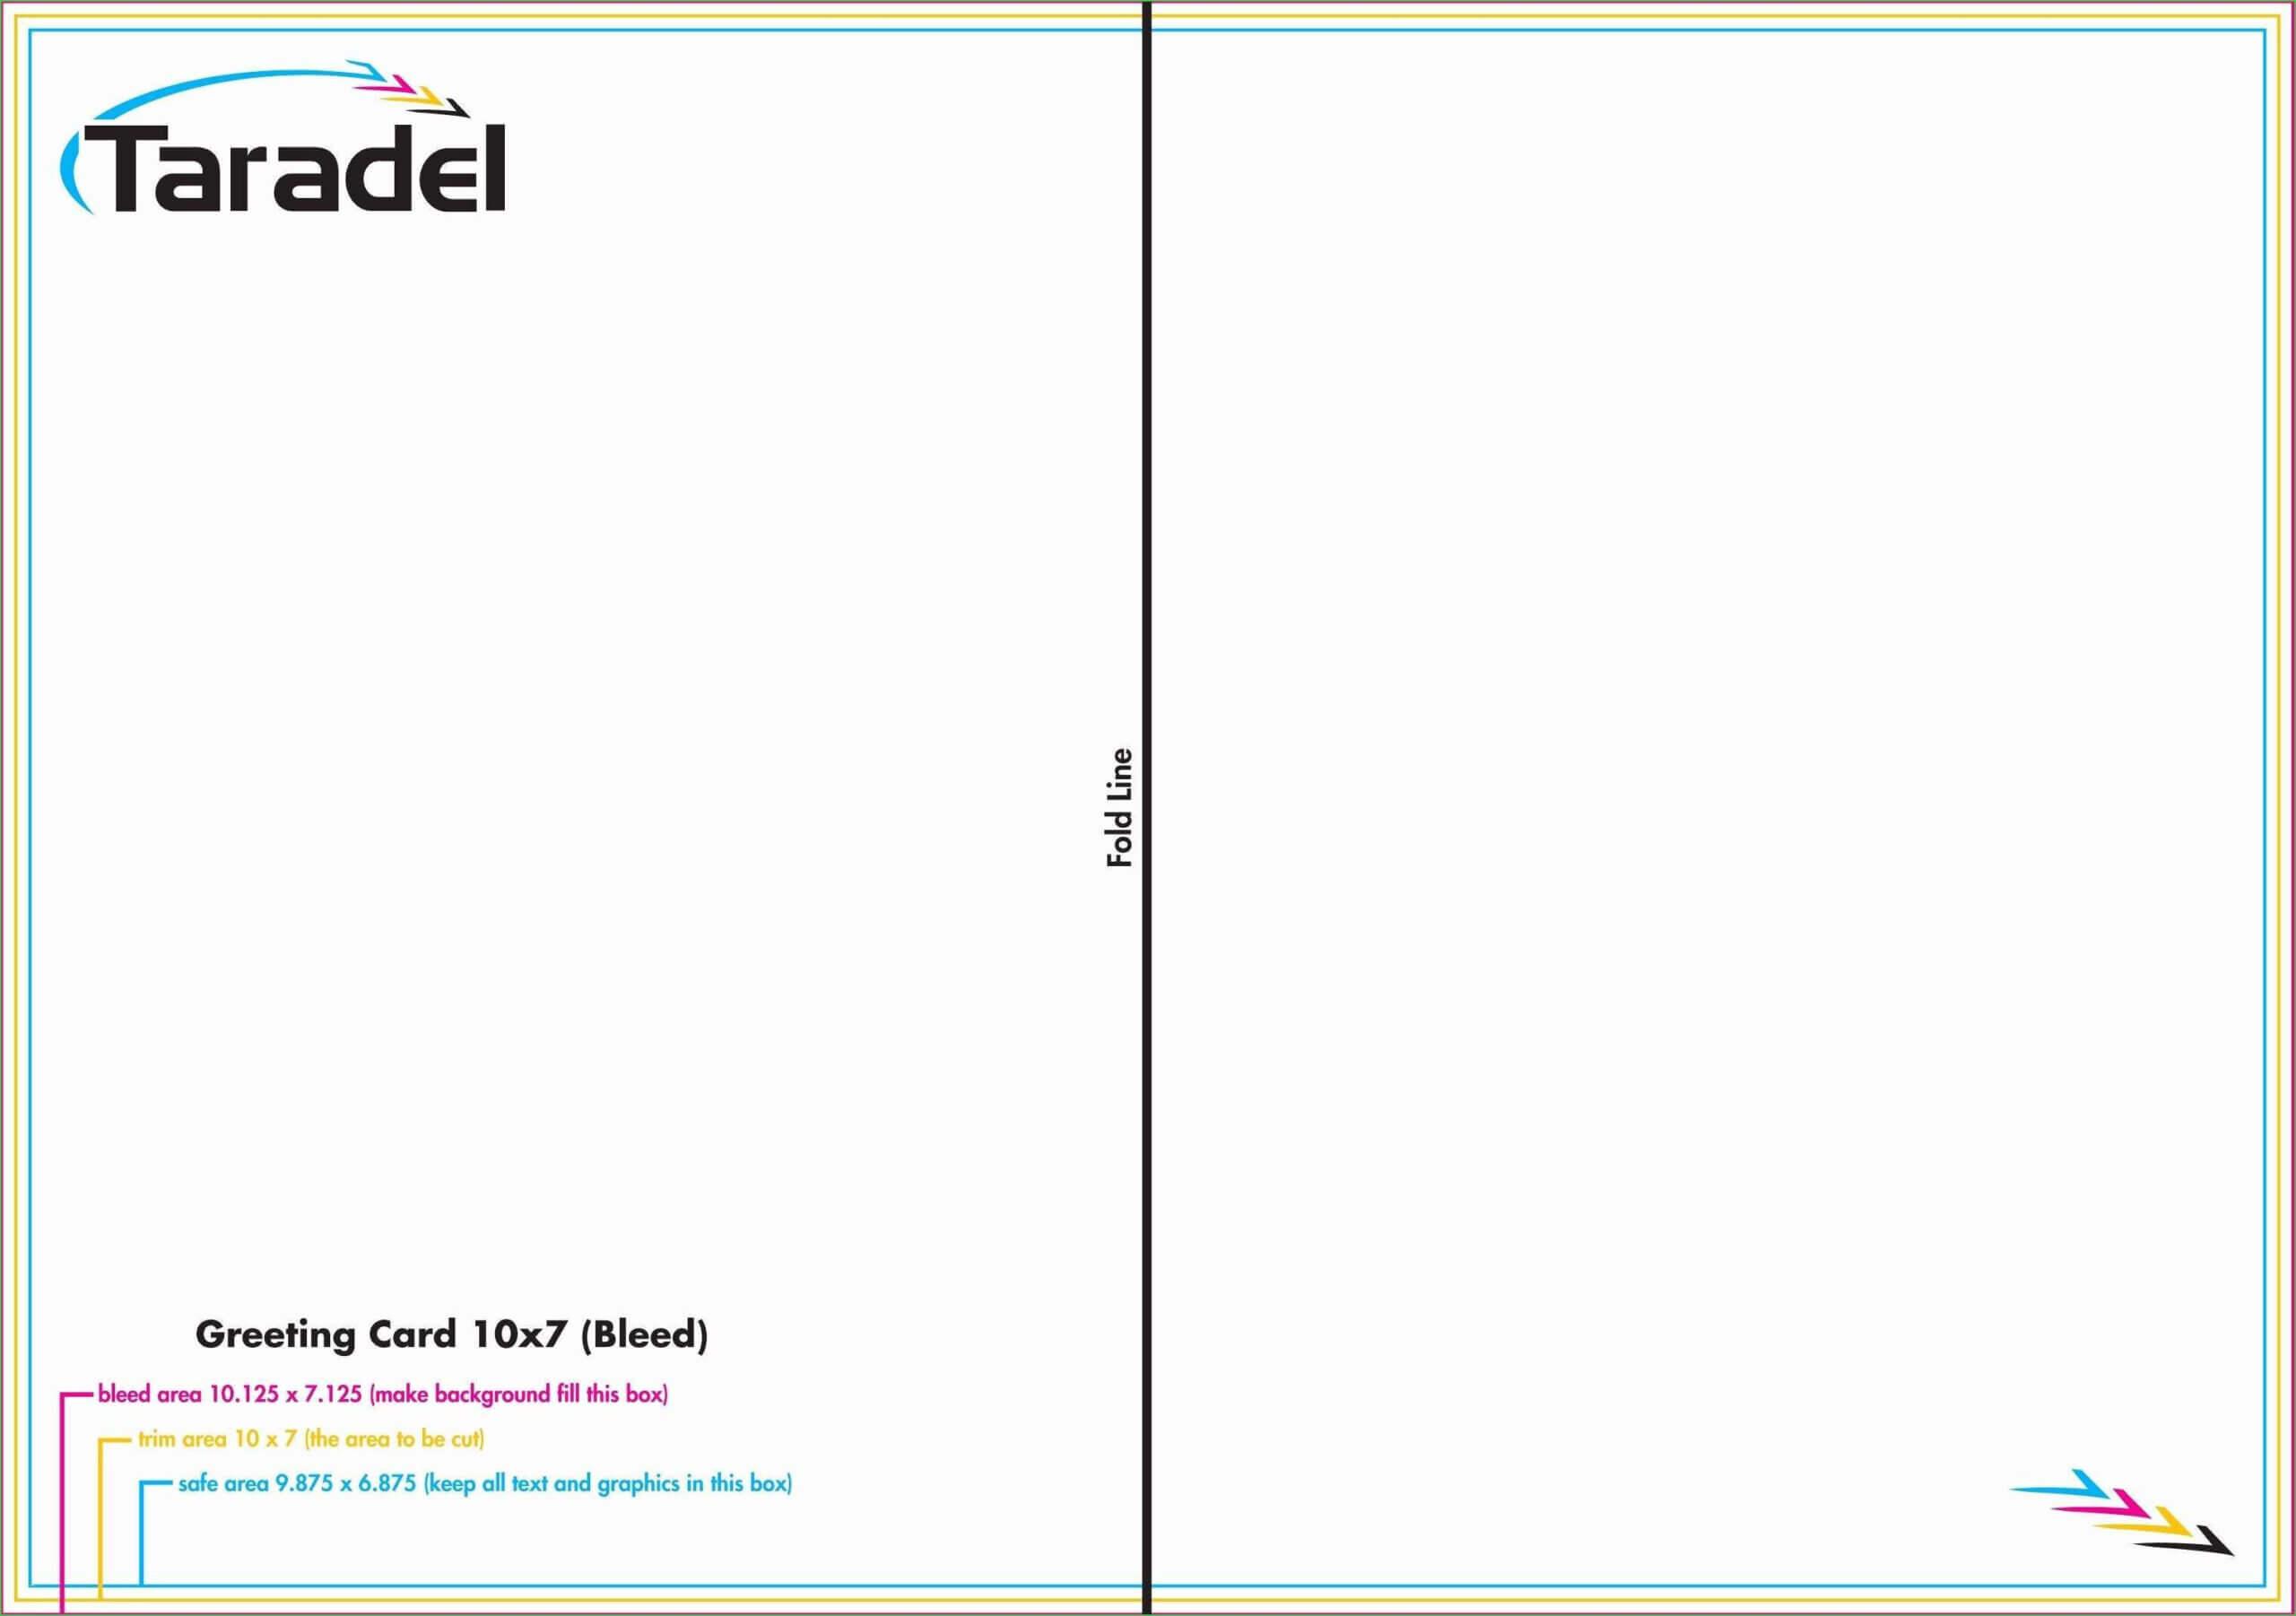 003 Quarter Fold Card Template Photoshop Indesign Greeting In Quarter Fold Card Template